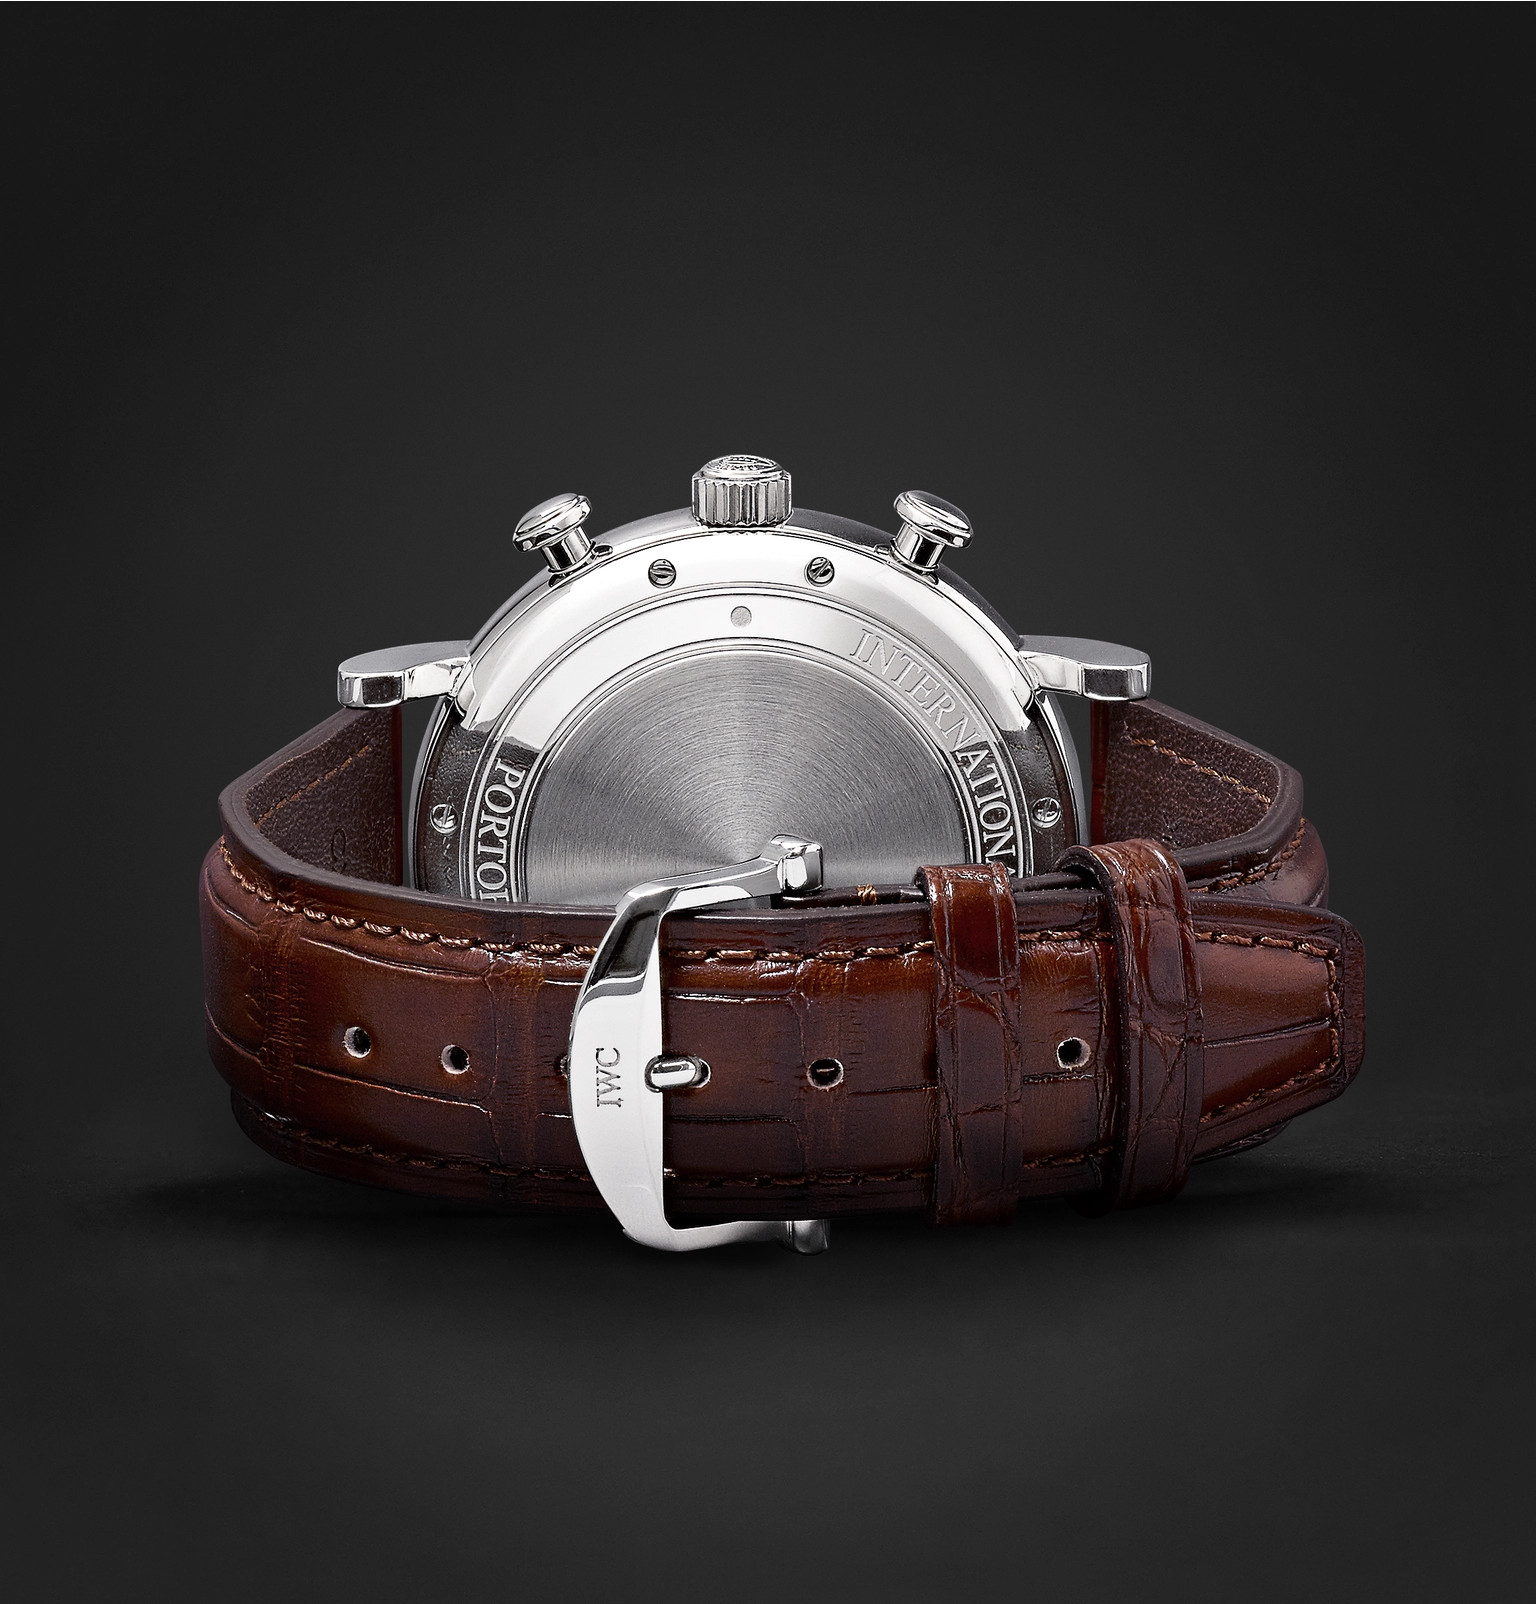 huge discount a00ac cbad6 IWC SCHAFFHAUSEN - Portofino Chronograph 42mm Stainless ...